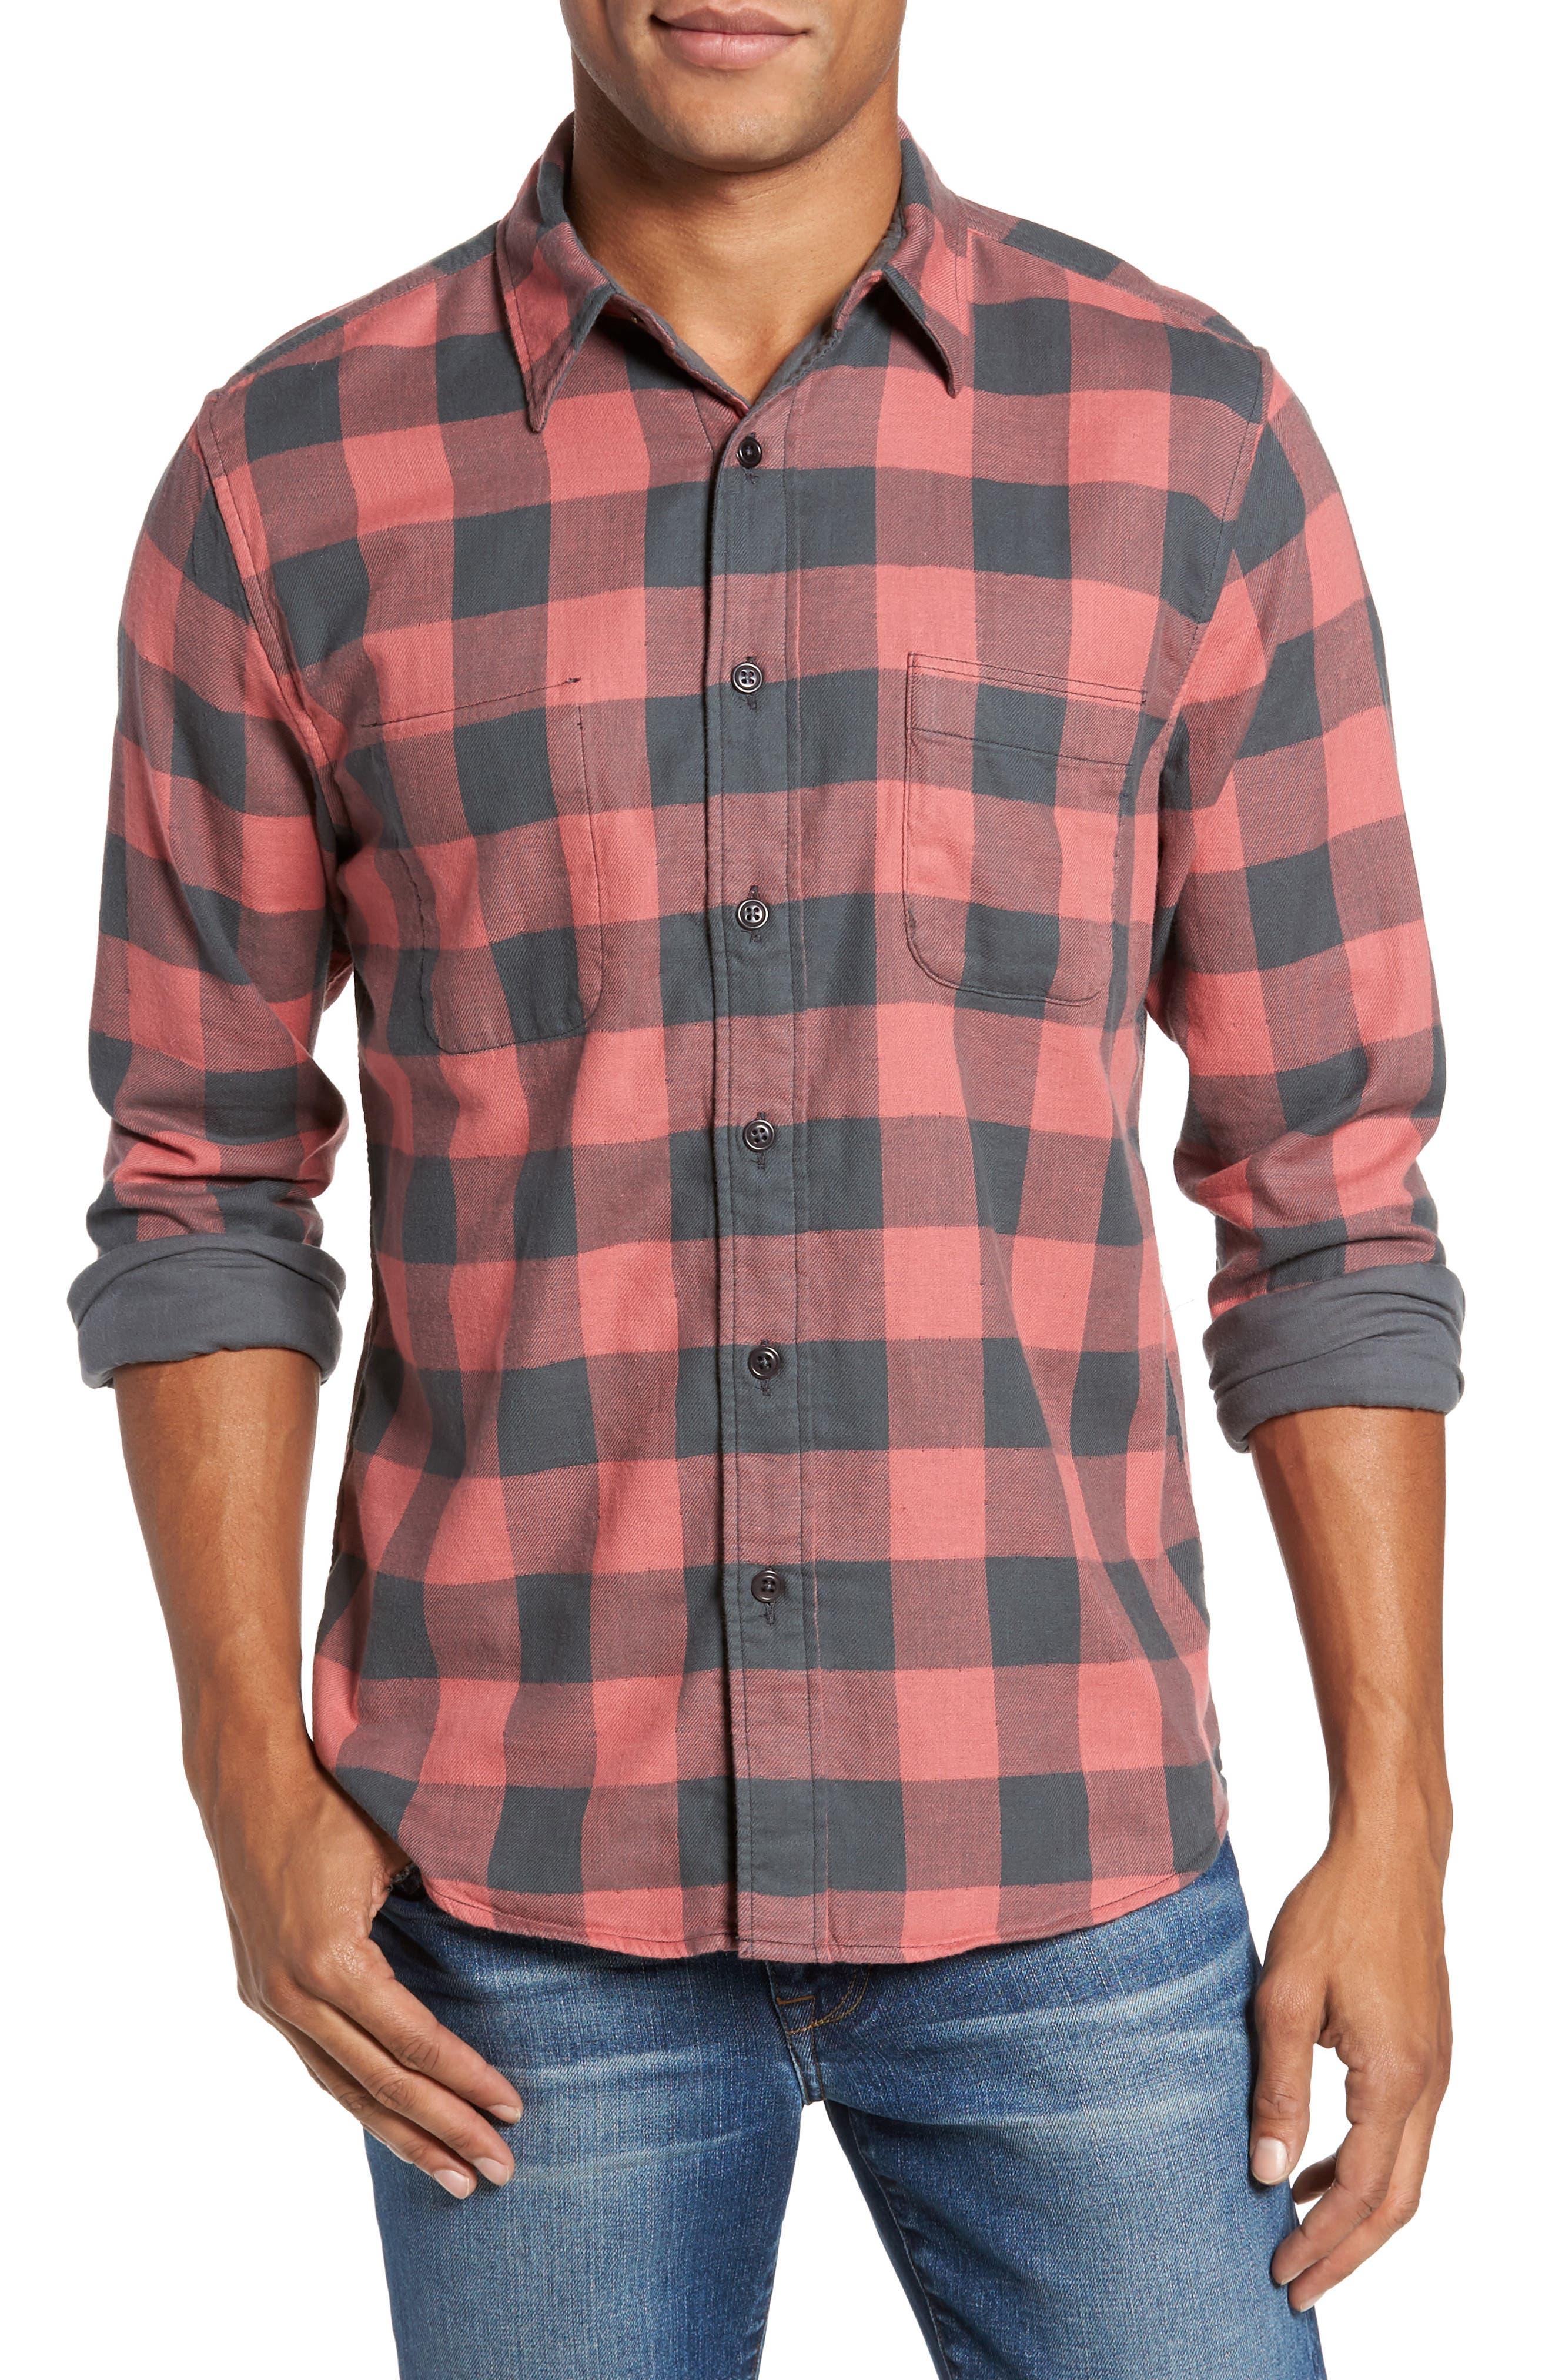 Belmar Trim Fit Long Sleeve Reversible Sport Shirt,                         Main,                         color, Grey / Red Buffalo Check